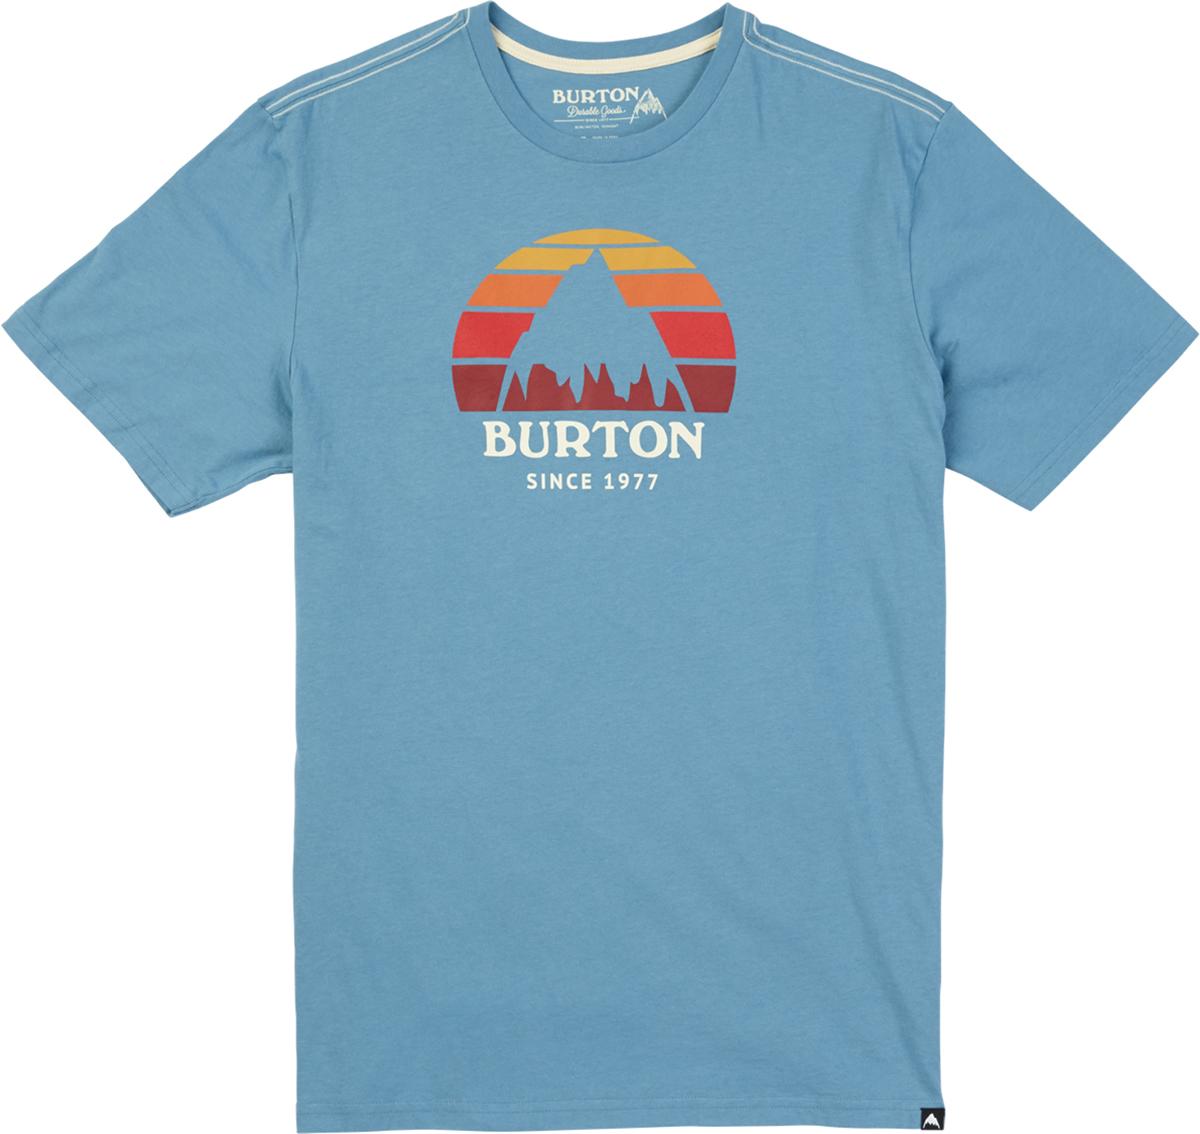 Футболка мужская Burton Mb Underhill Ss, цвет: голубой. 17398103400. Размер XXL (54)